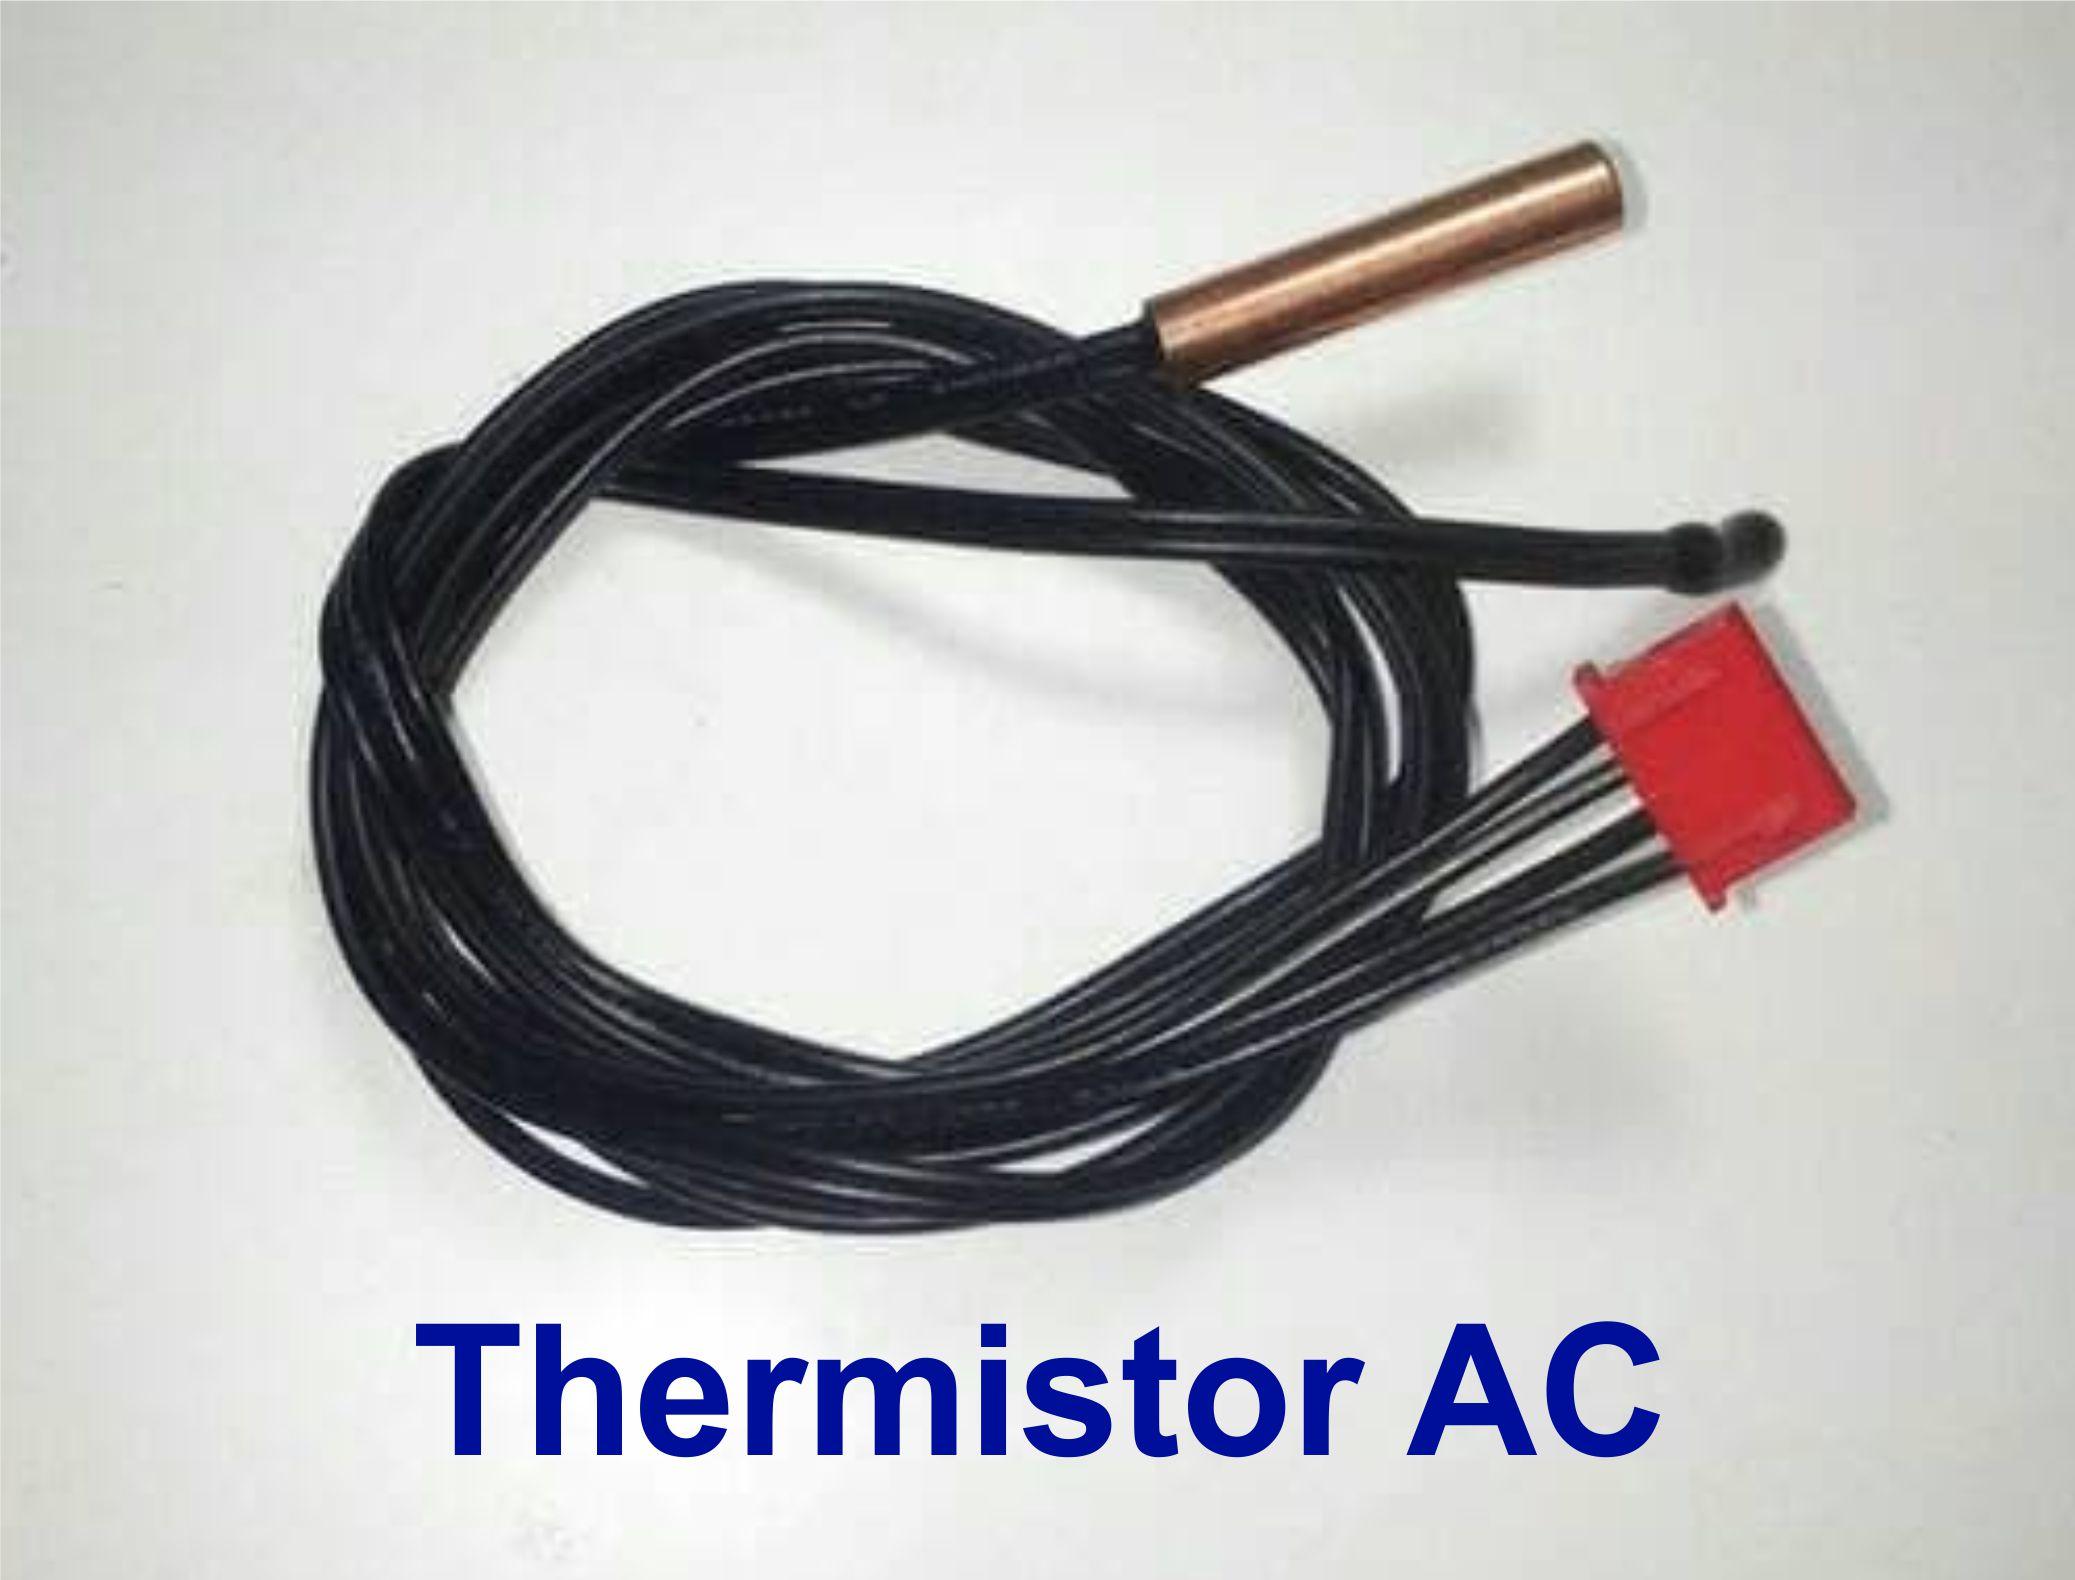 thermistor ac